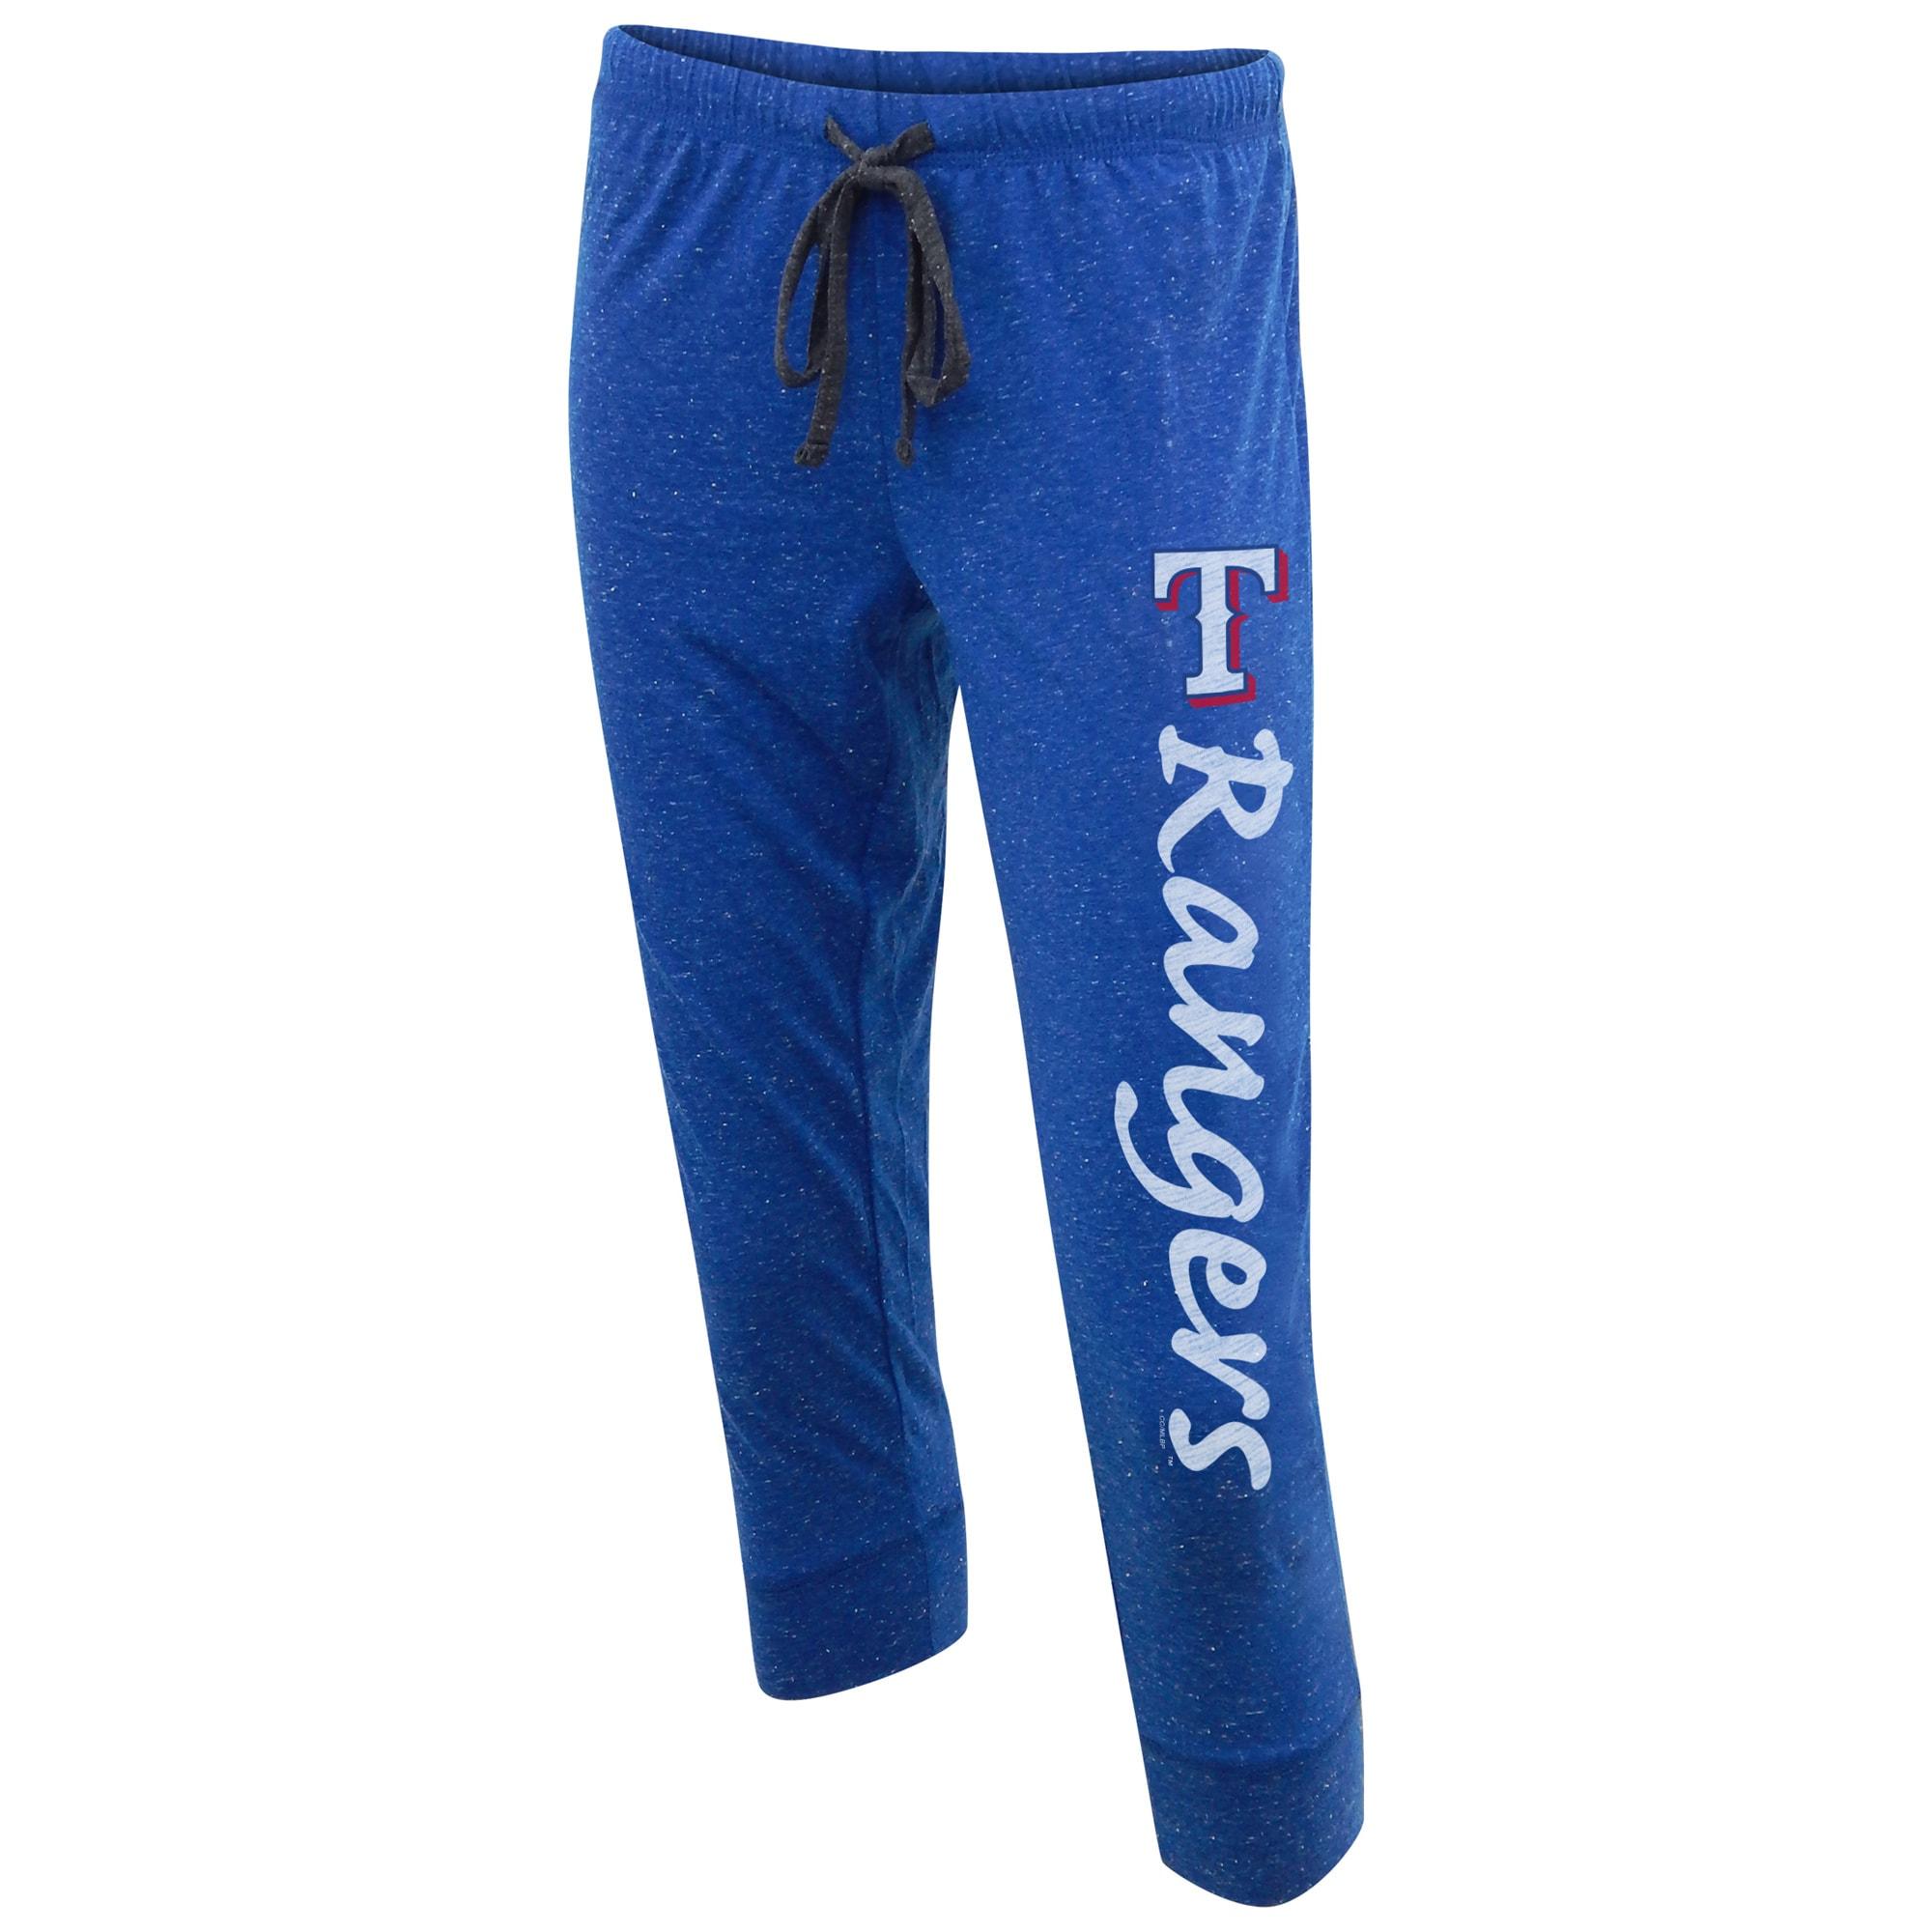 Texas Rangers Concepts Sport Women's Dash Knit Capri Pants - Royal